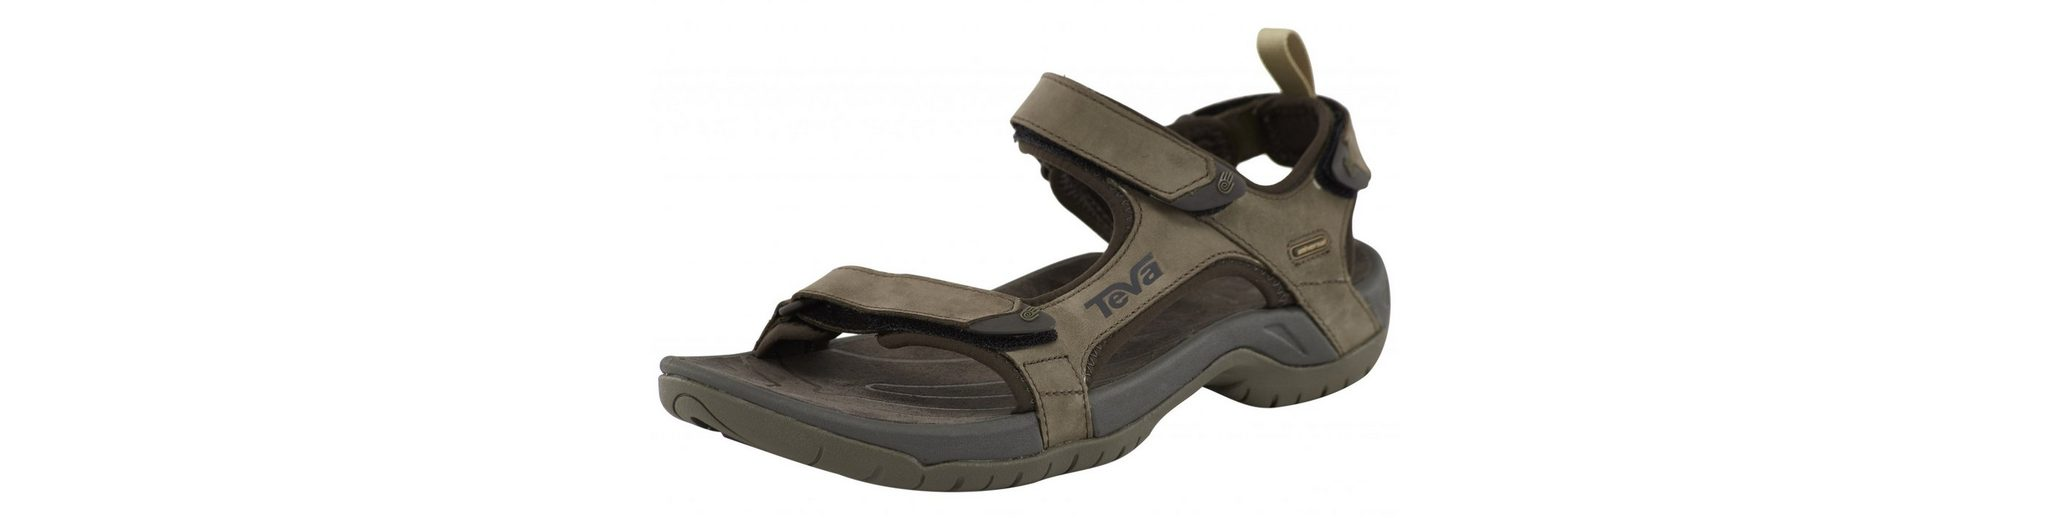 Teva Sandale Tanza Leather Sandals Men Billig Verkauf Kauf a3y3rAV